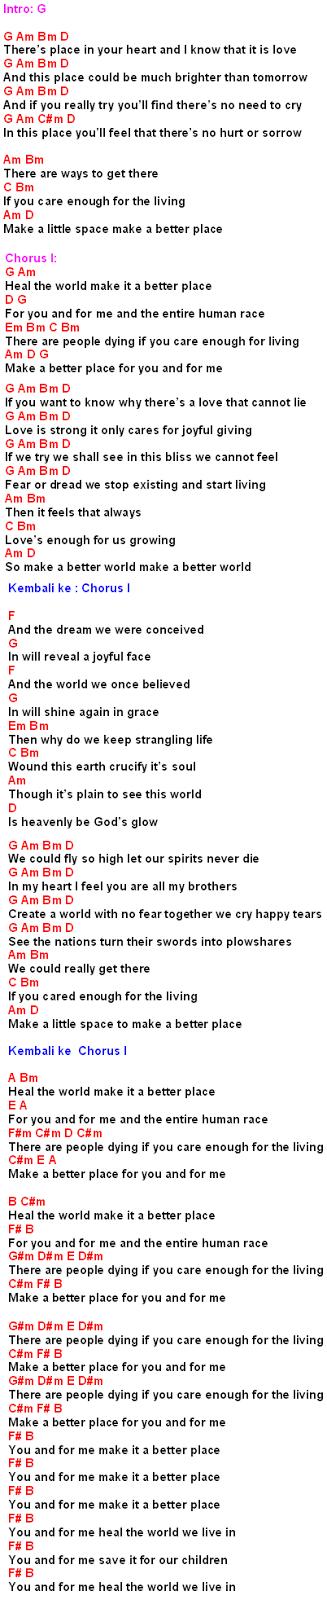 Lirik Lagu Michael Jackson Heal The World : lirik, michael, jackson, world, Chord, Gitar, World, Walls